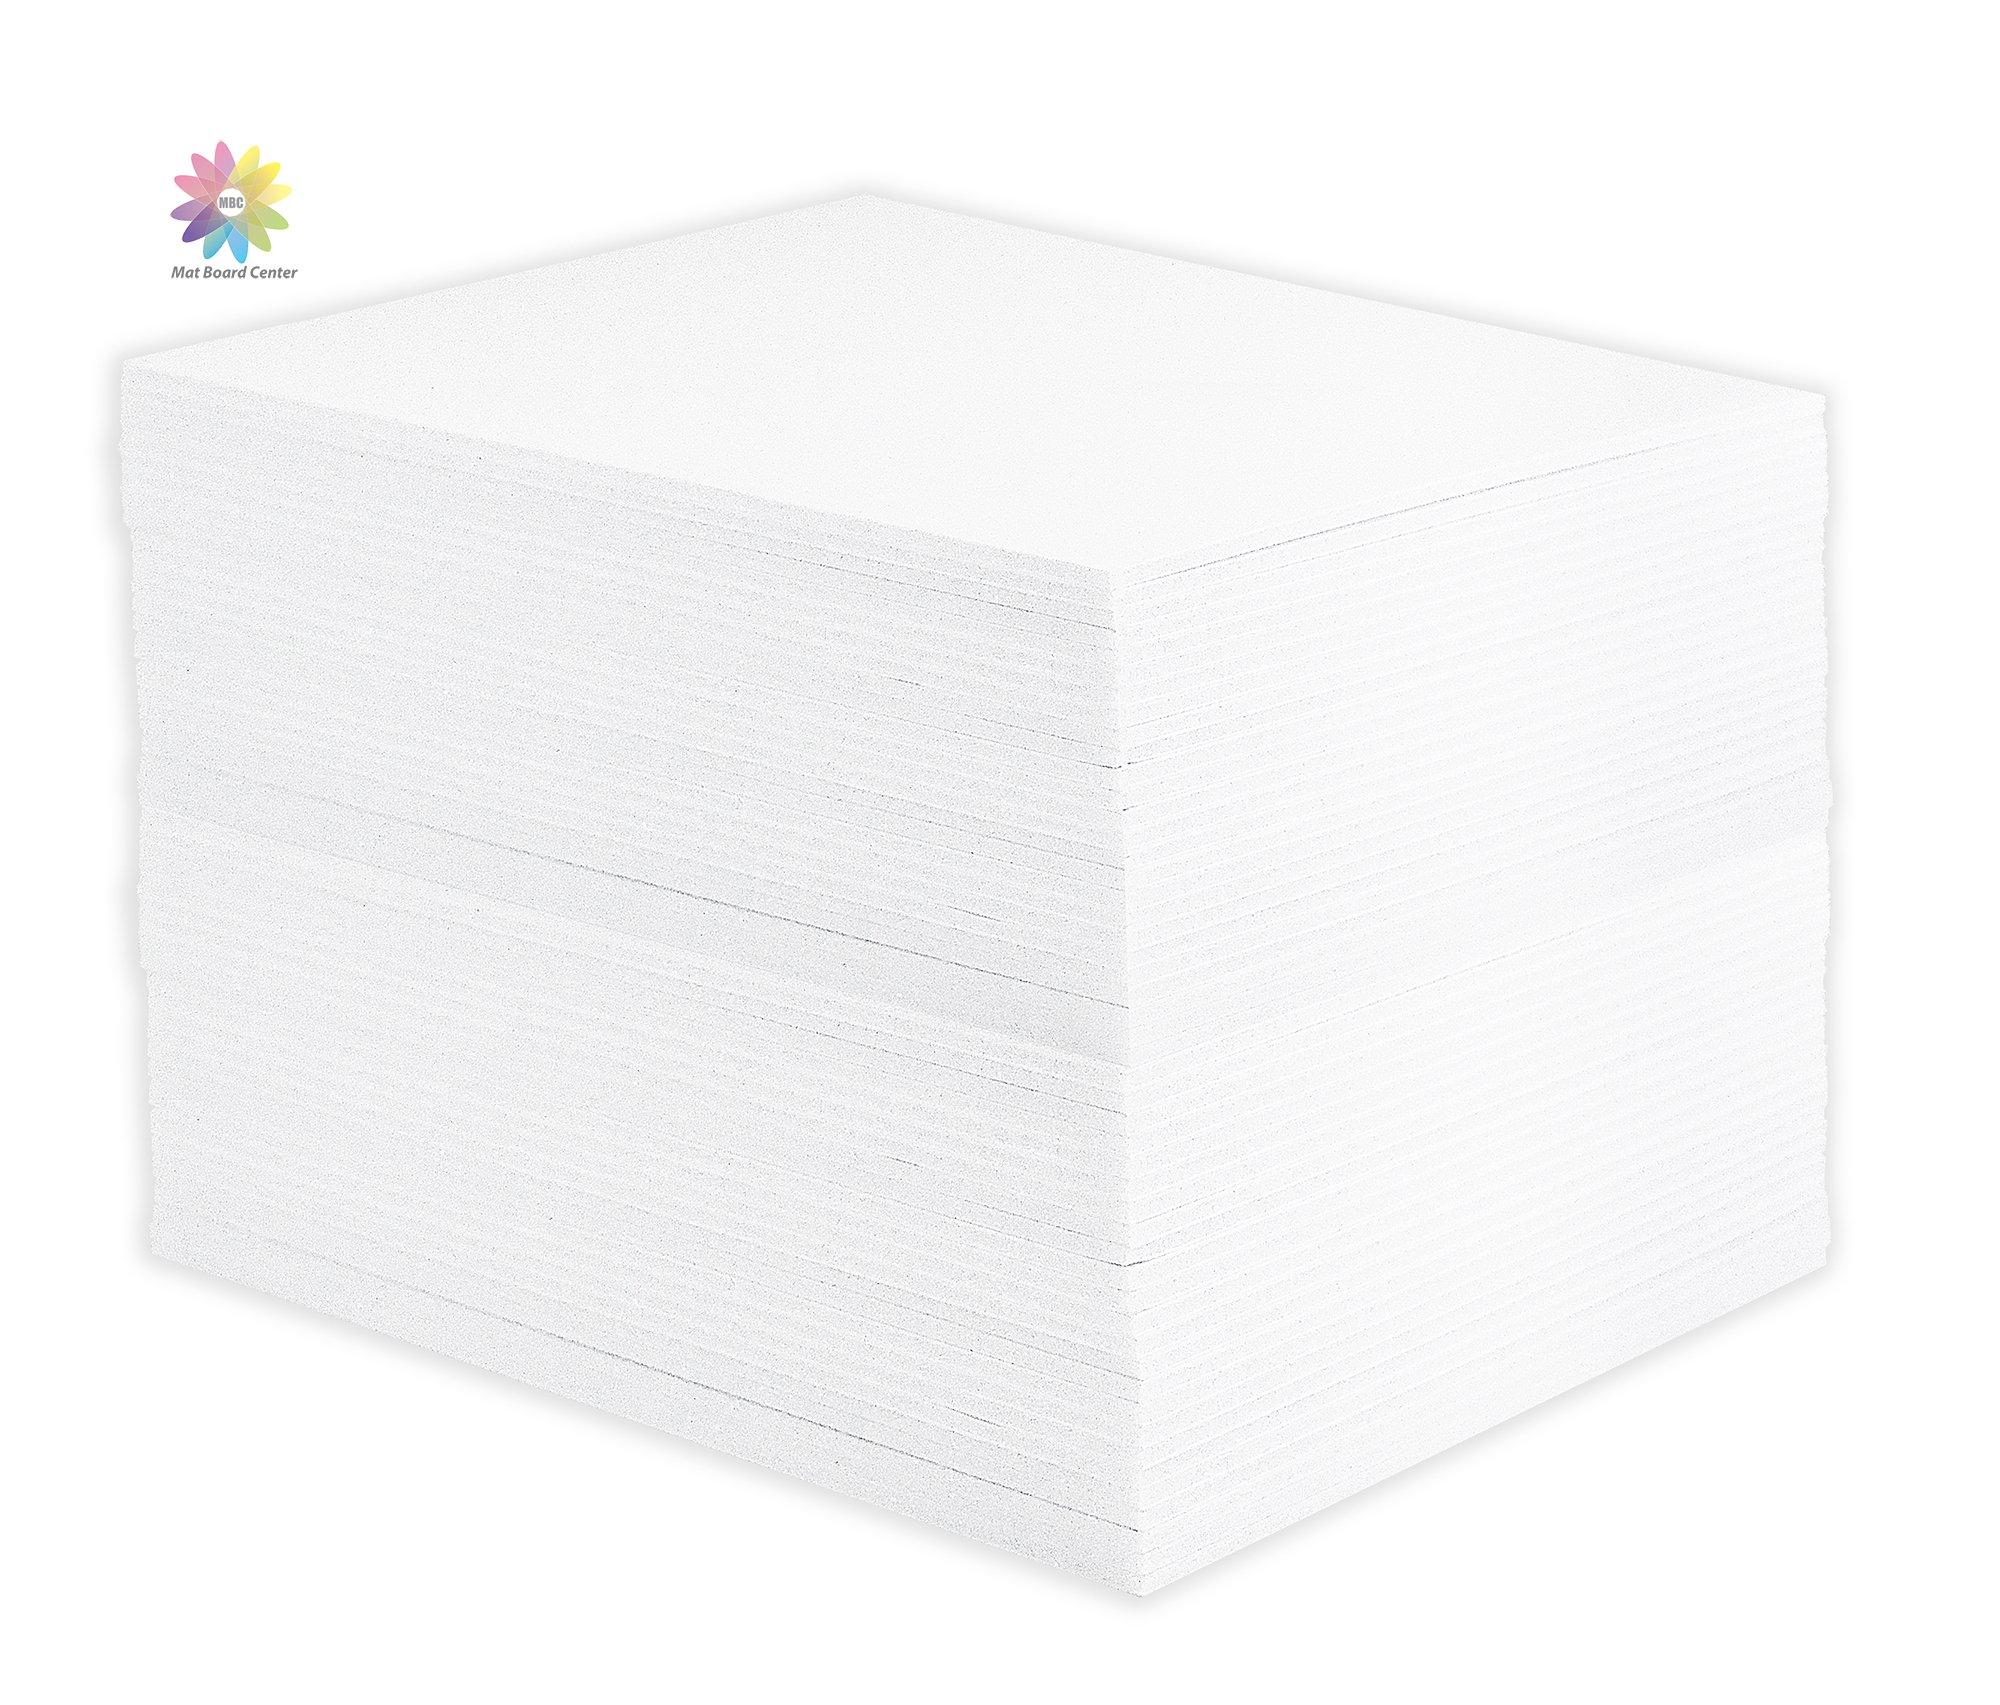 Mat Board Center, Pack of 50 8x10 1/8'' White Foam Core Backing Boards by MBC MAT BOARD CENTER